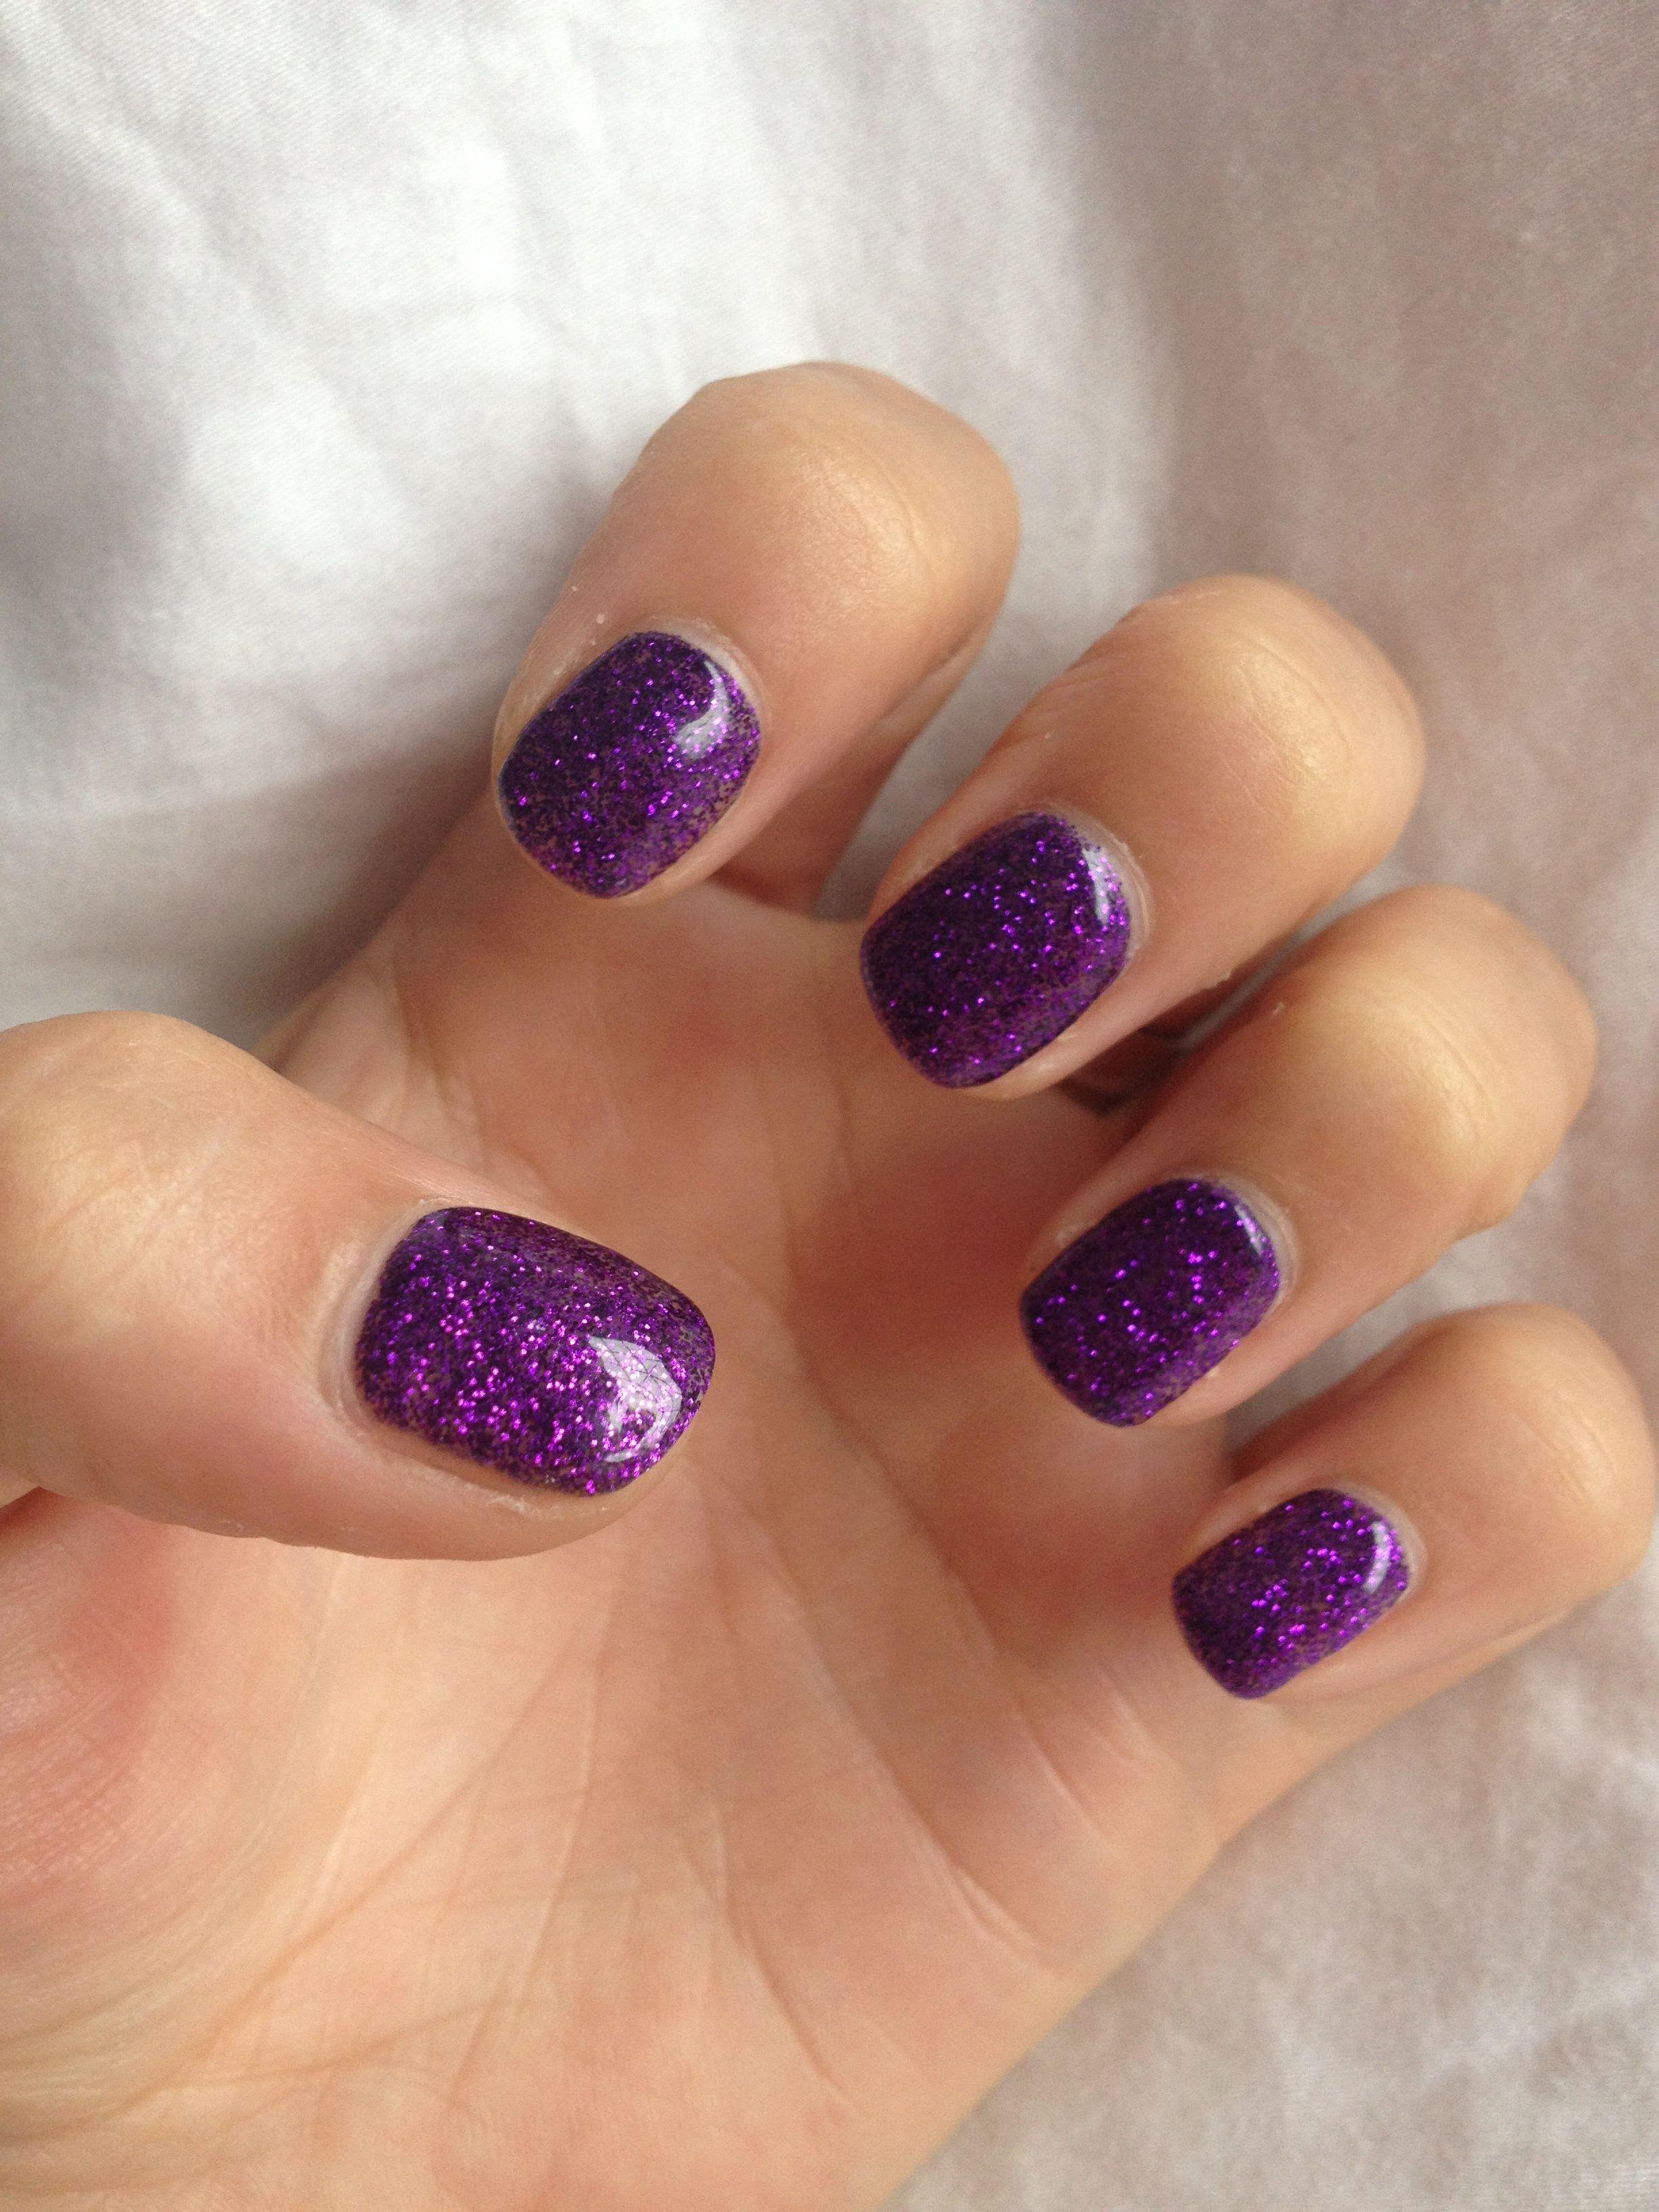 Purple Shellac nails. | Nail Files in 2019 | Nails, Purple ...